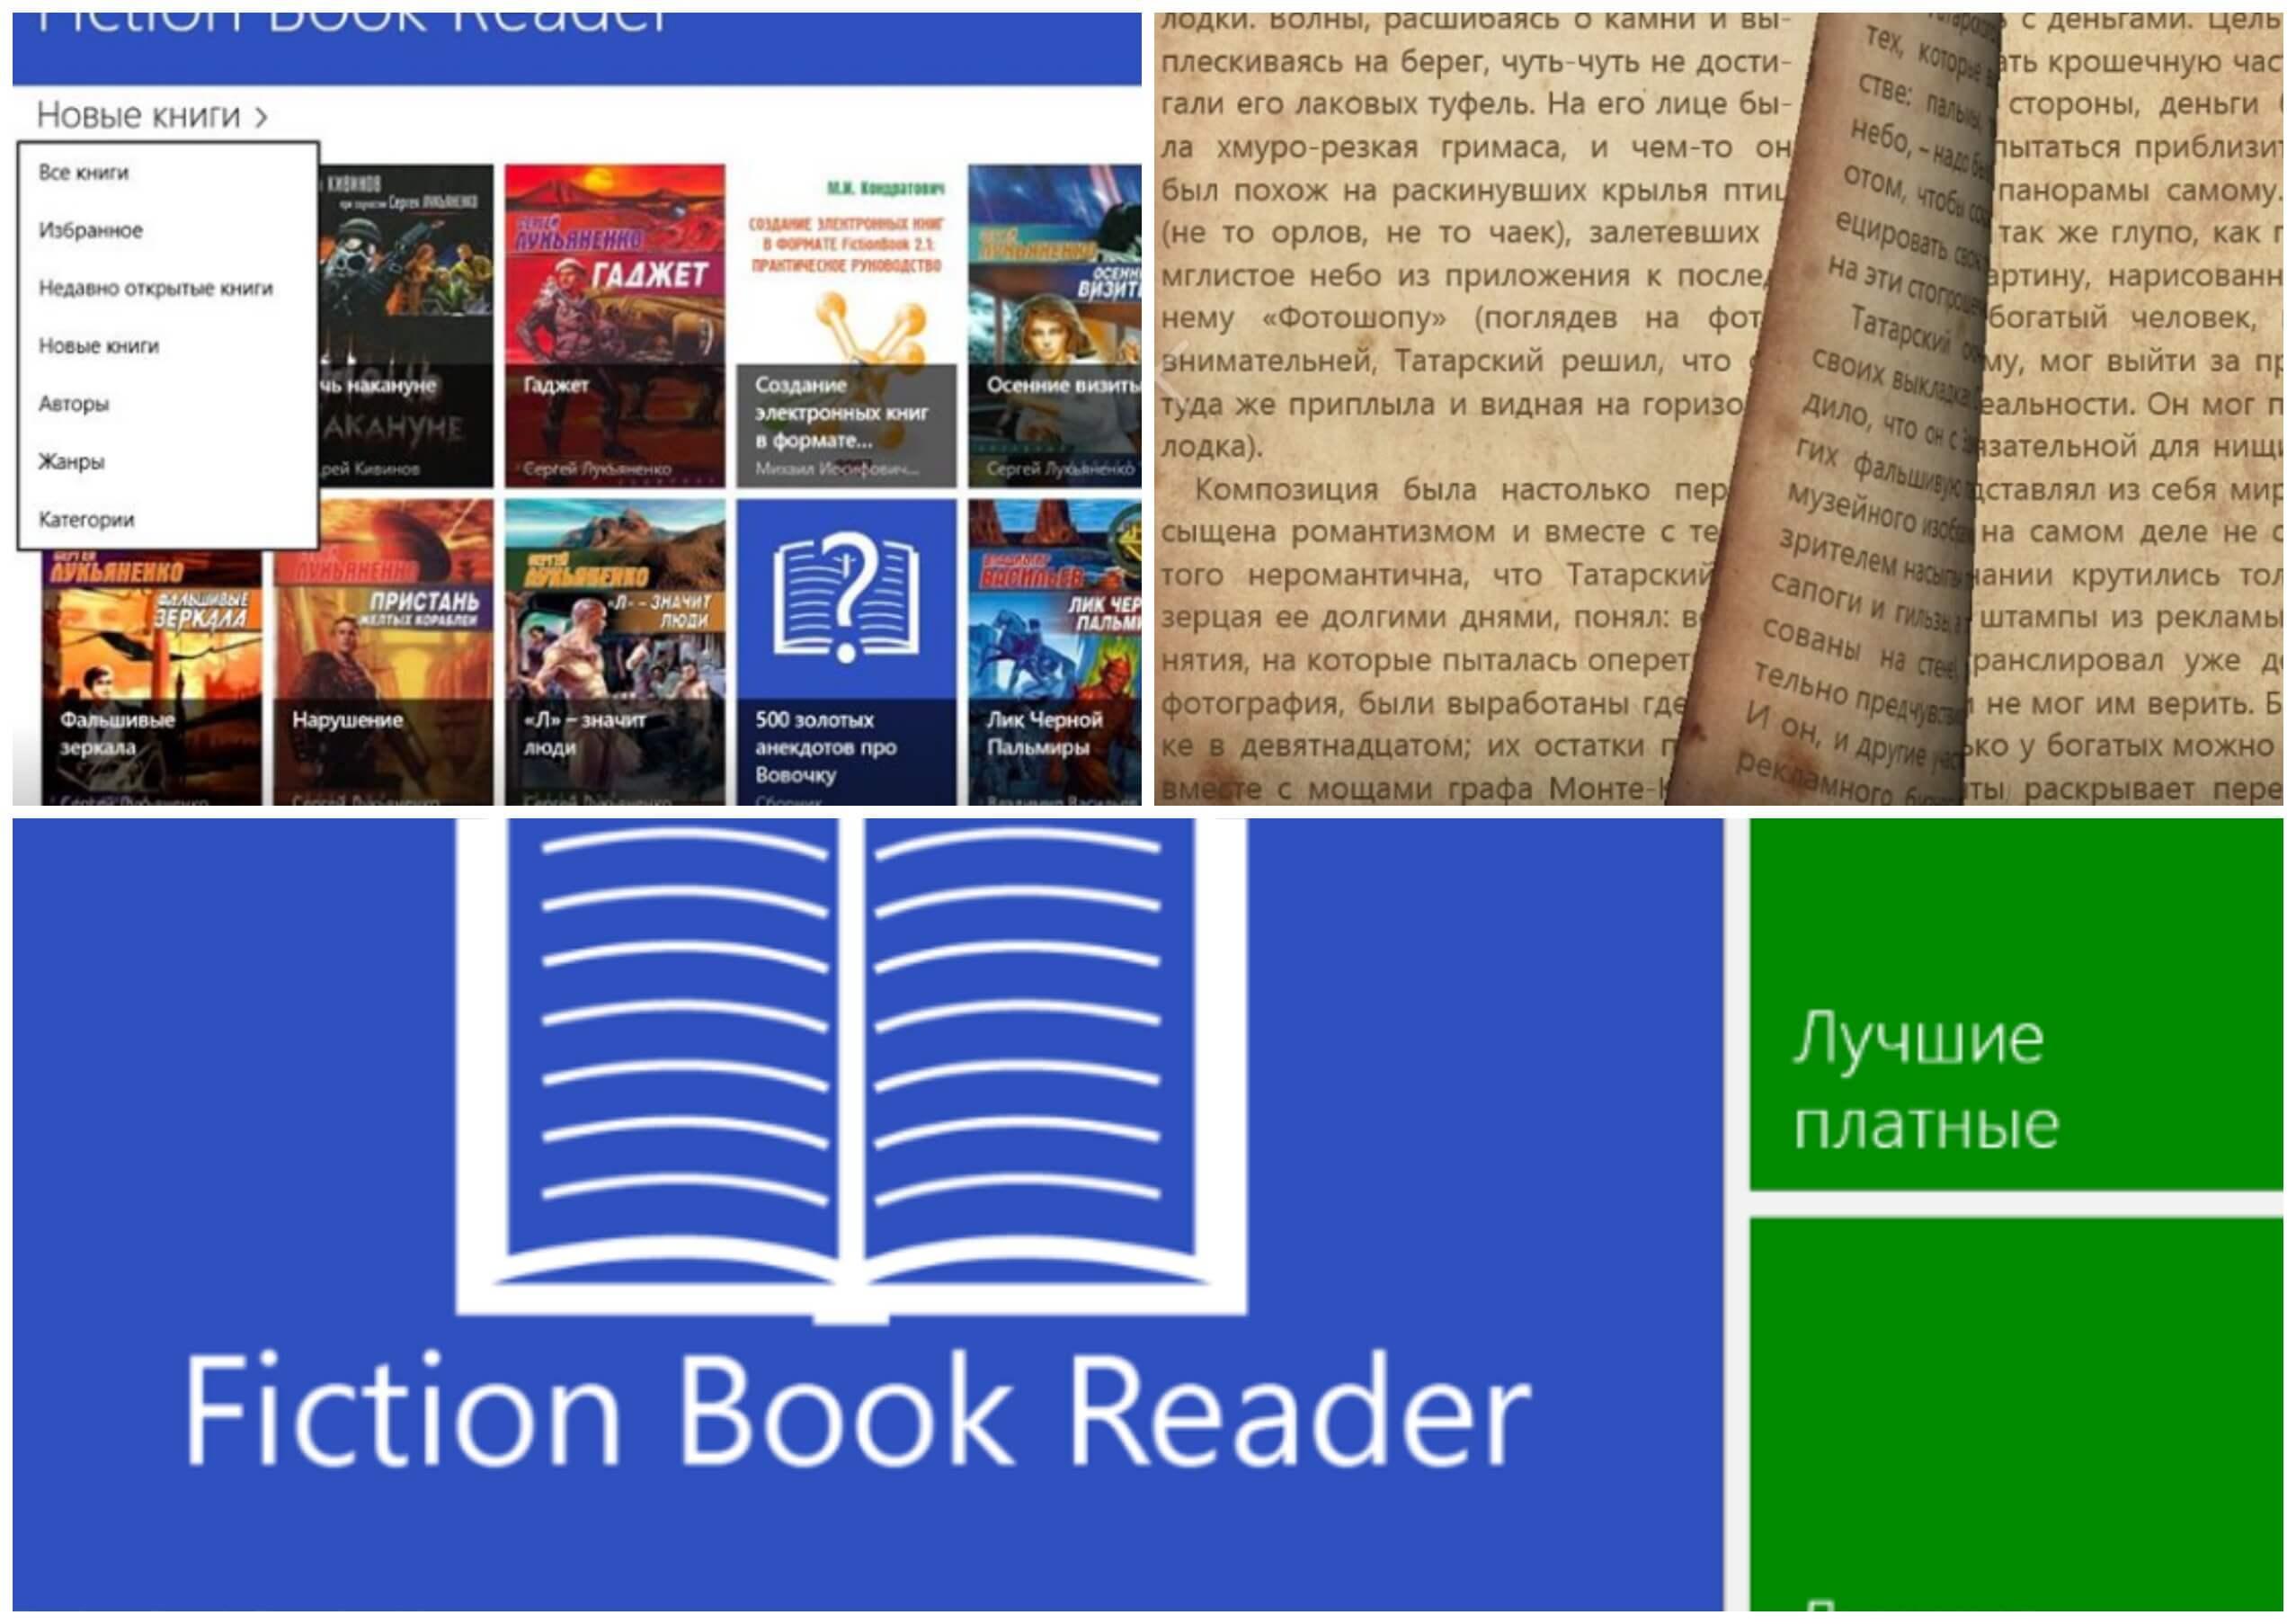 На фото изображено приложение Fiction book reader.